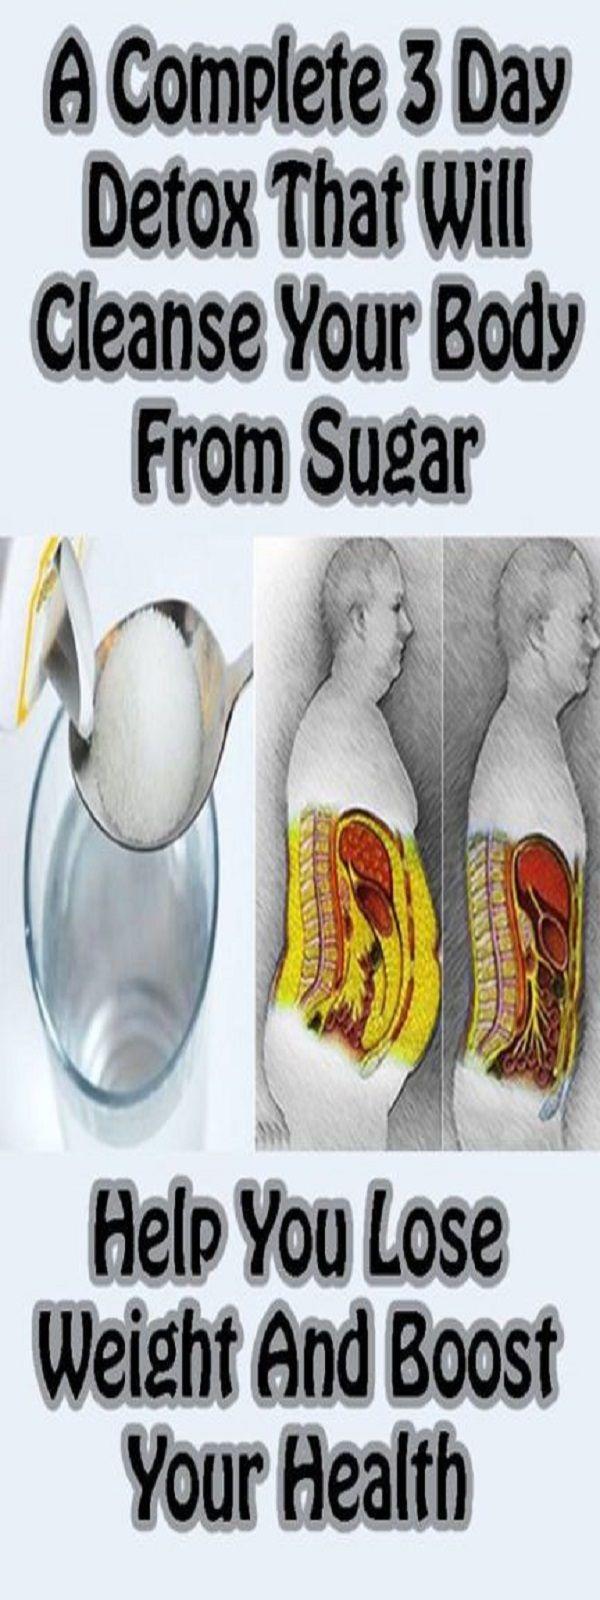 Can garcinia cause liver damage image 2